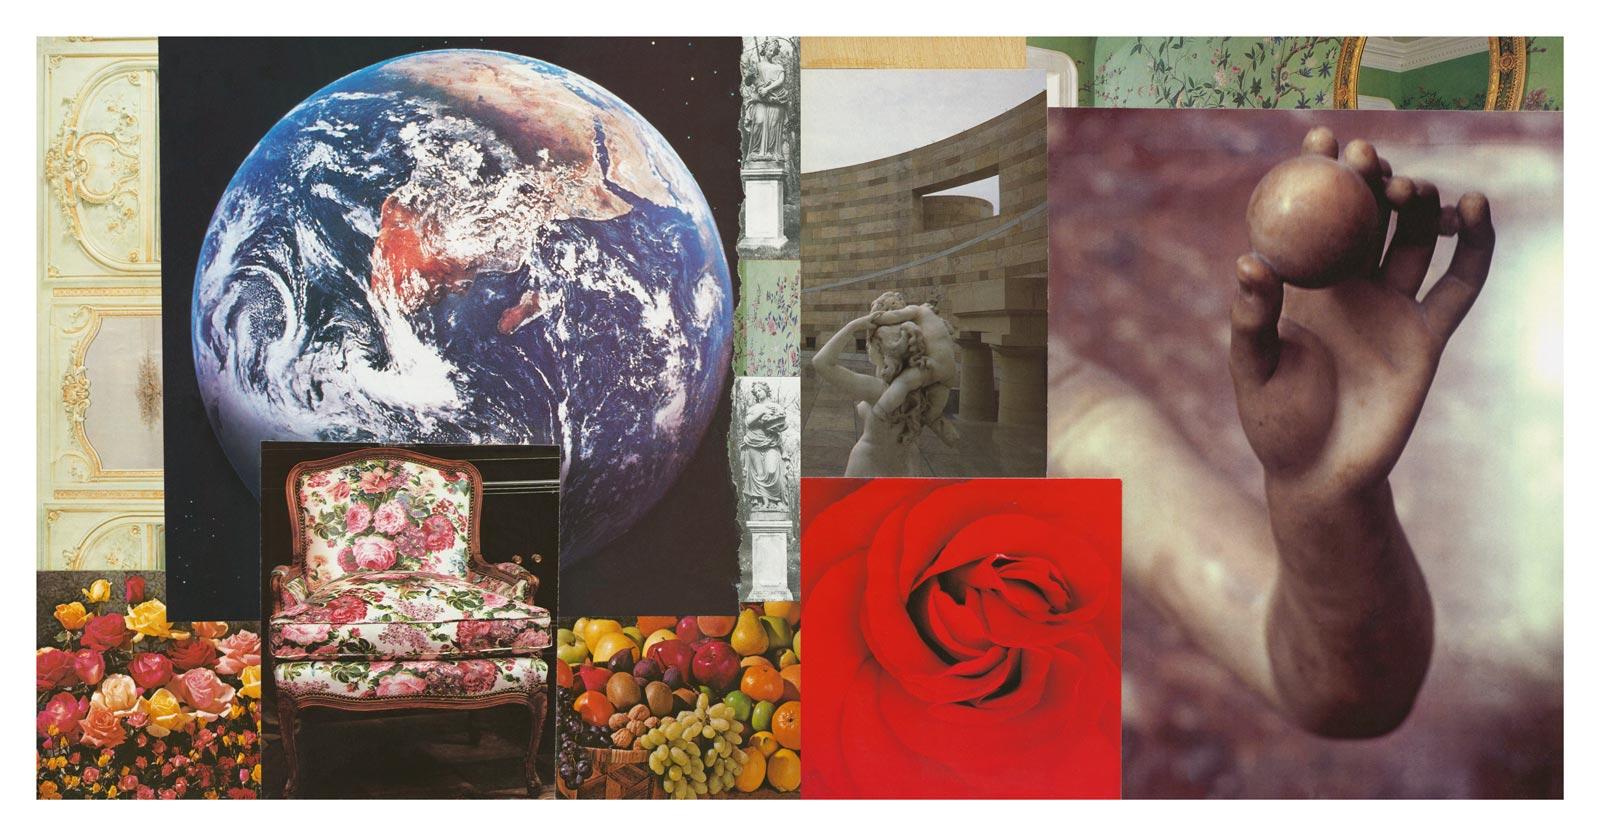 Deborah-Koenker-Visual-Artist_Planet-rose